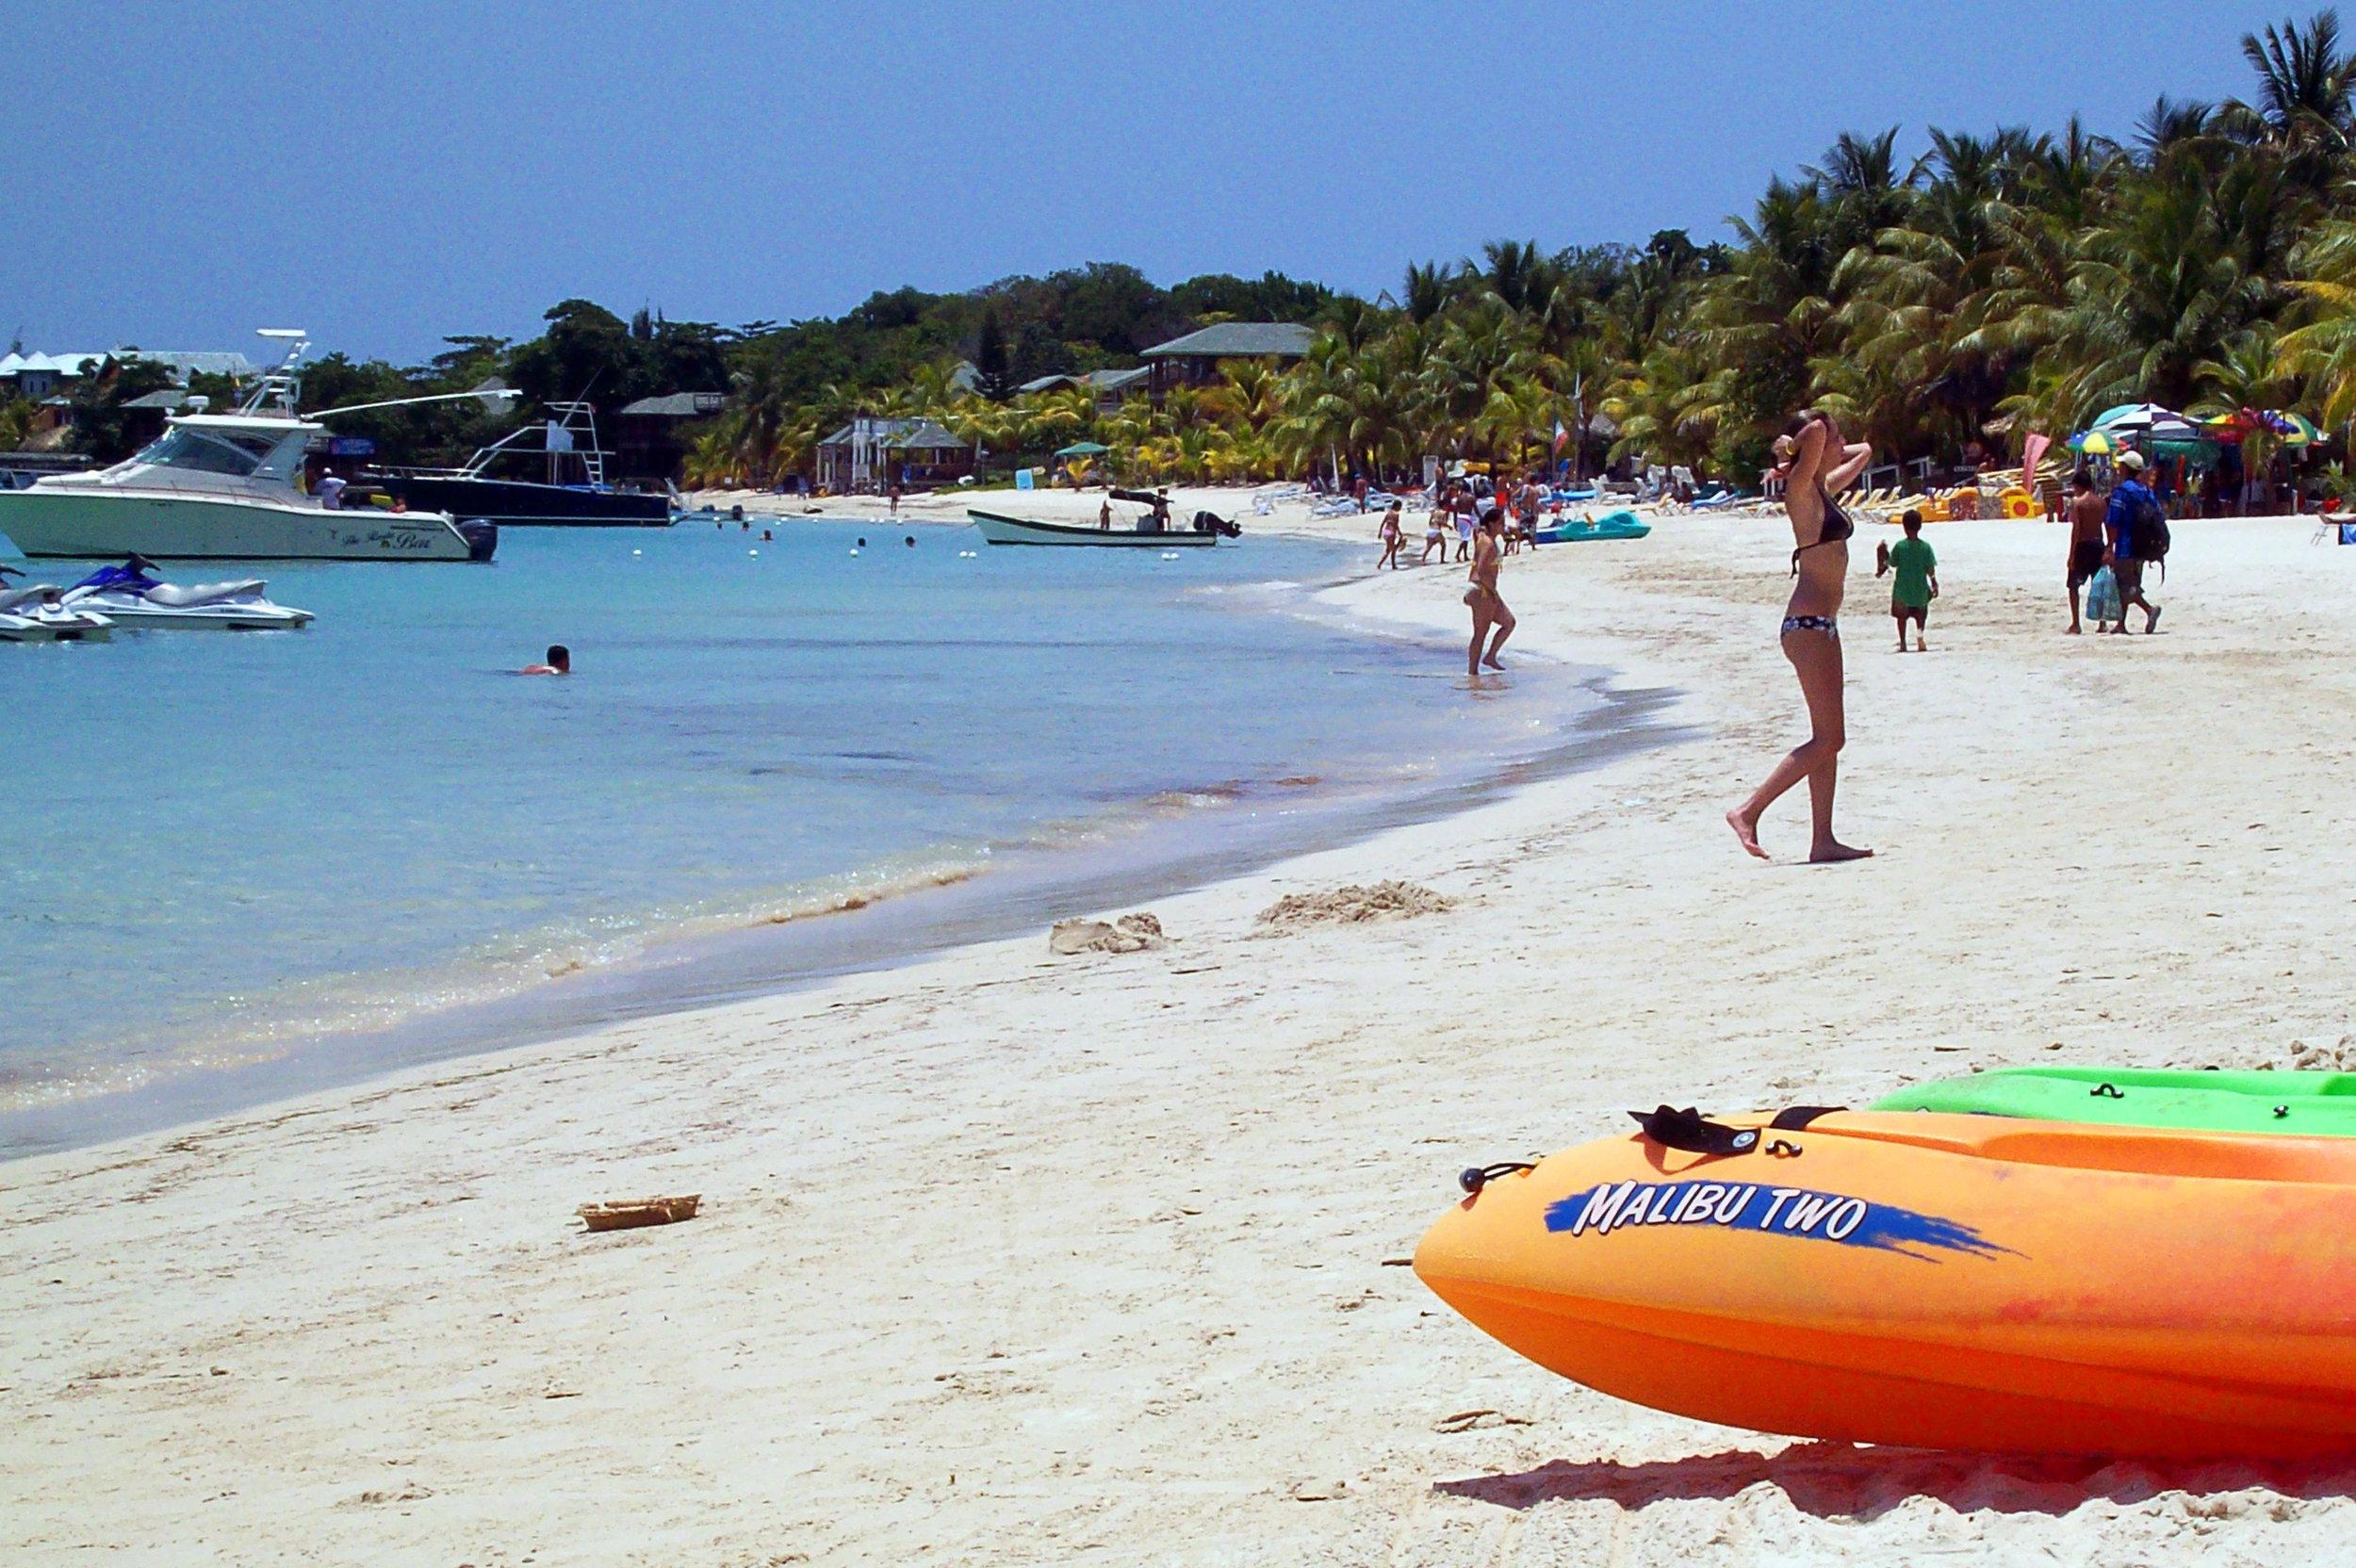 West_Bay_Beach_-Roatan_-Honduras-23May2009.jpg